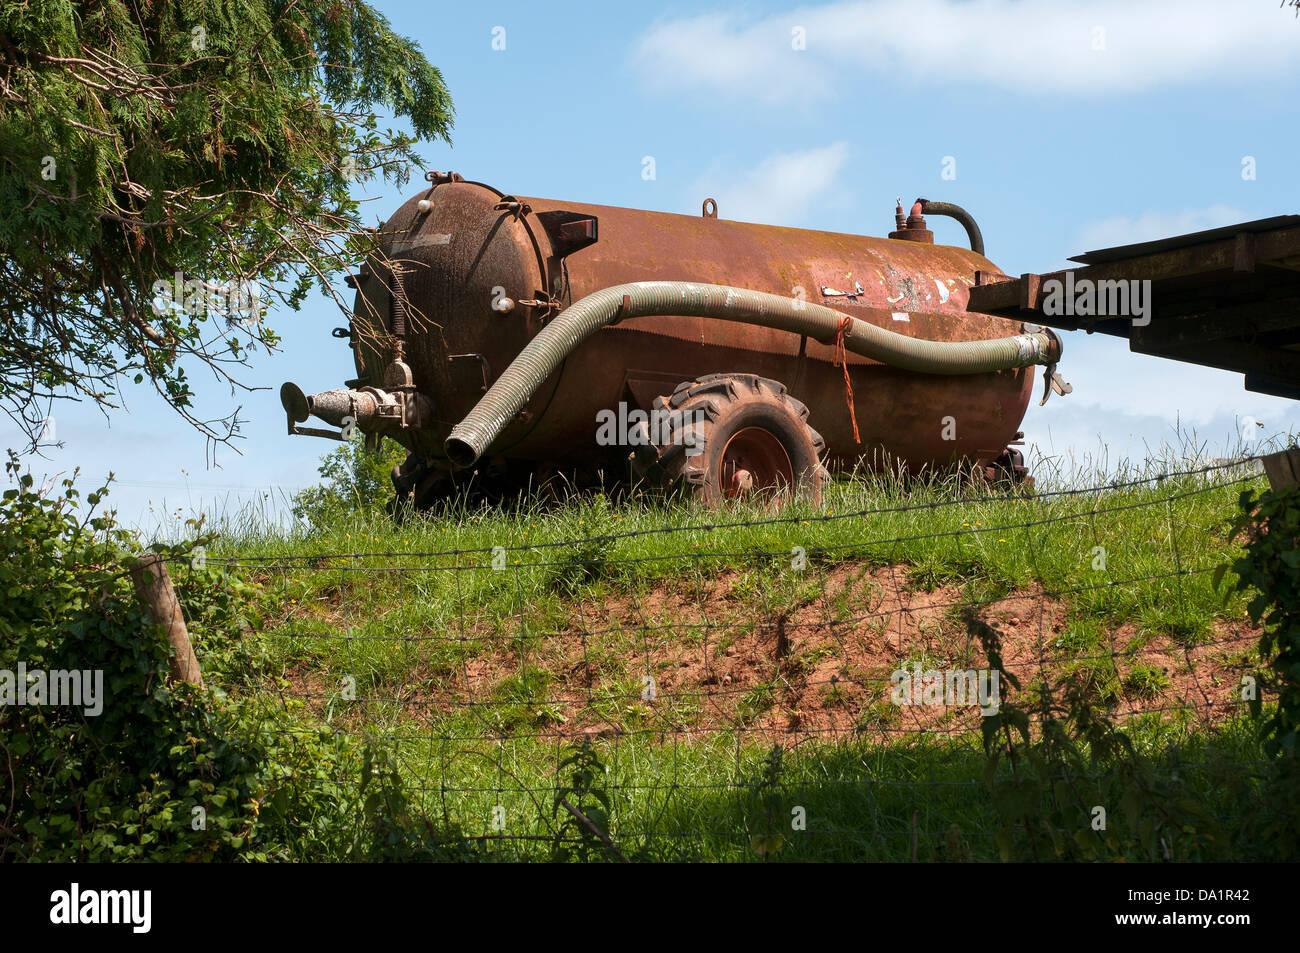 Farming,farm equipment,Farming in Devon,defra,the environment, rural development, the countryside, wildlife, animal - Stock Image